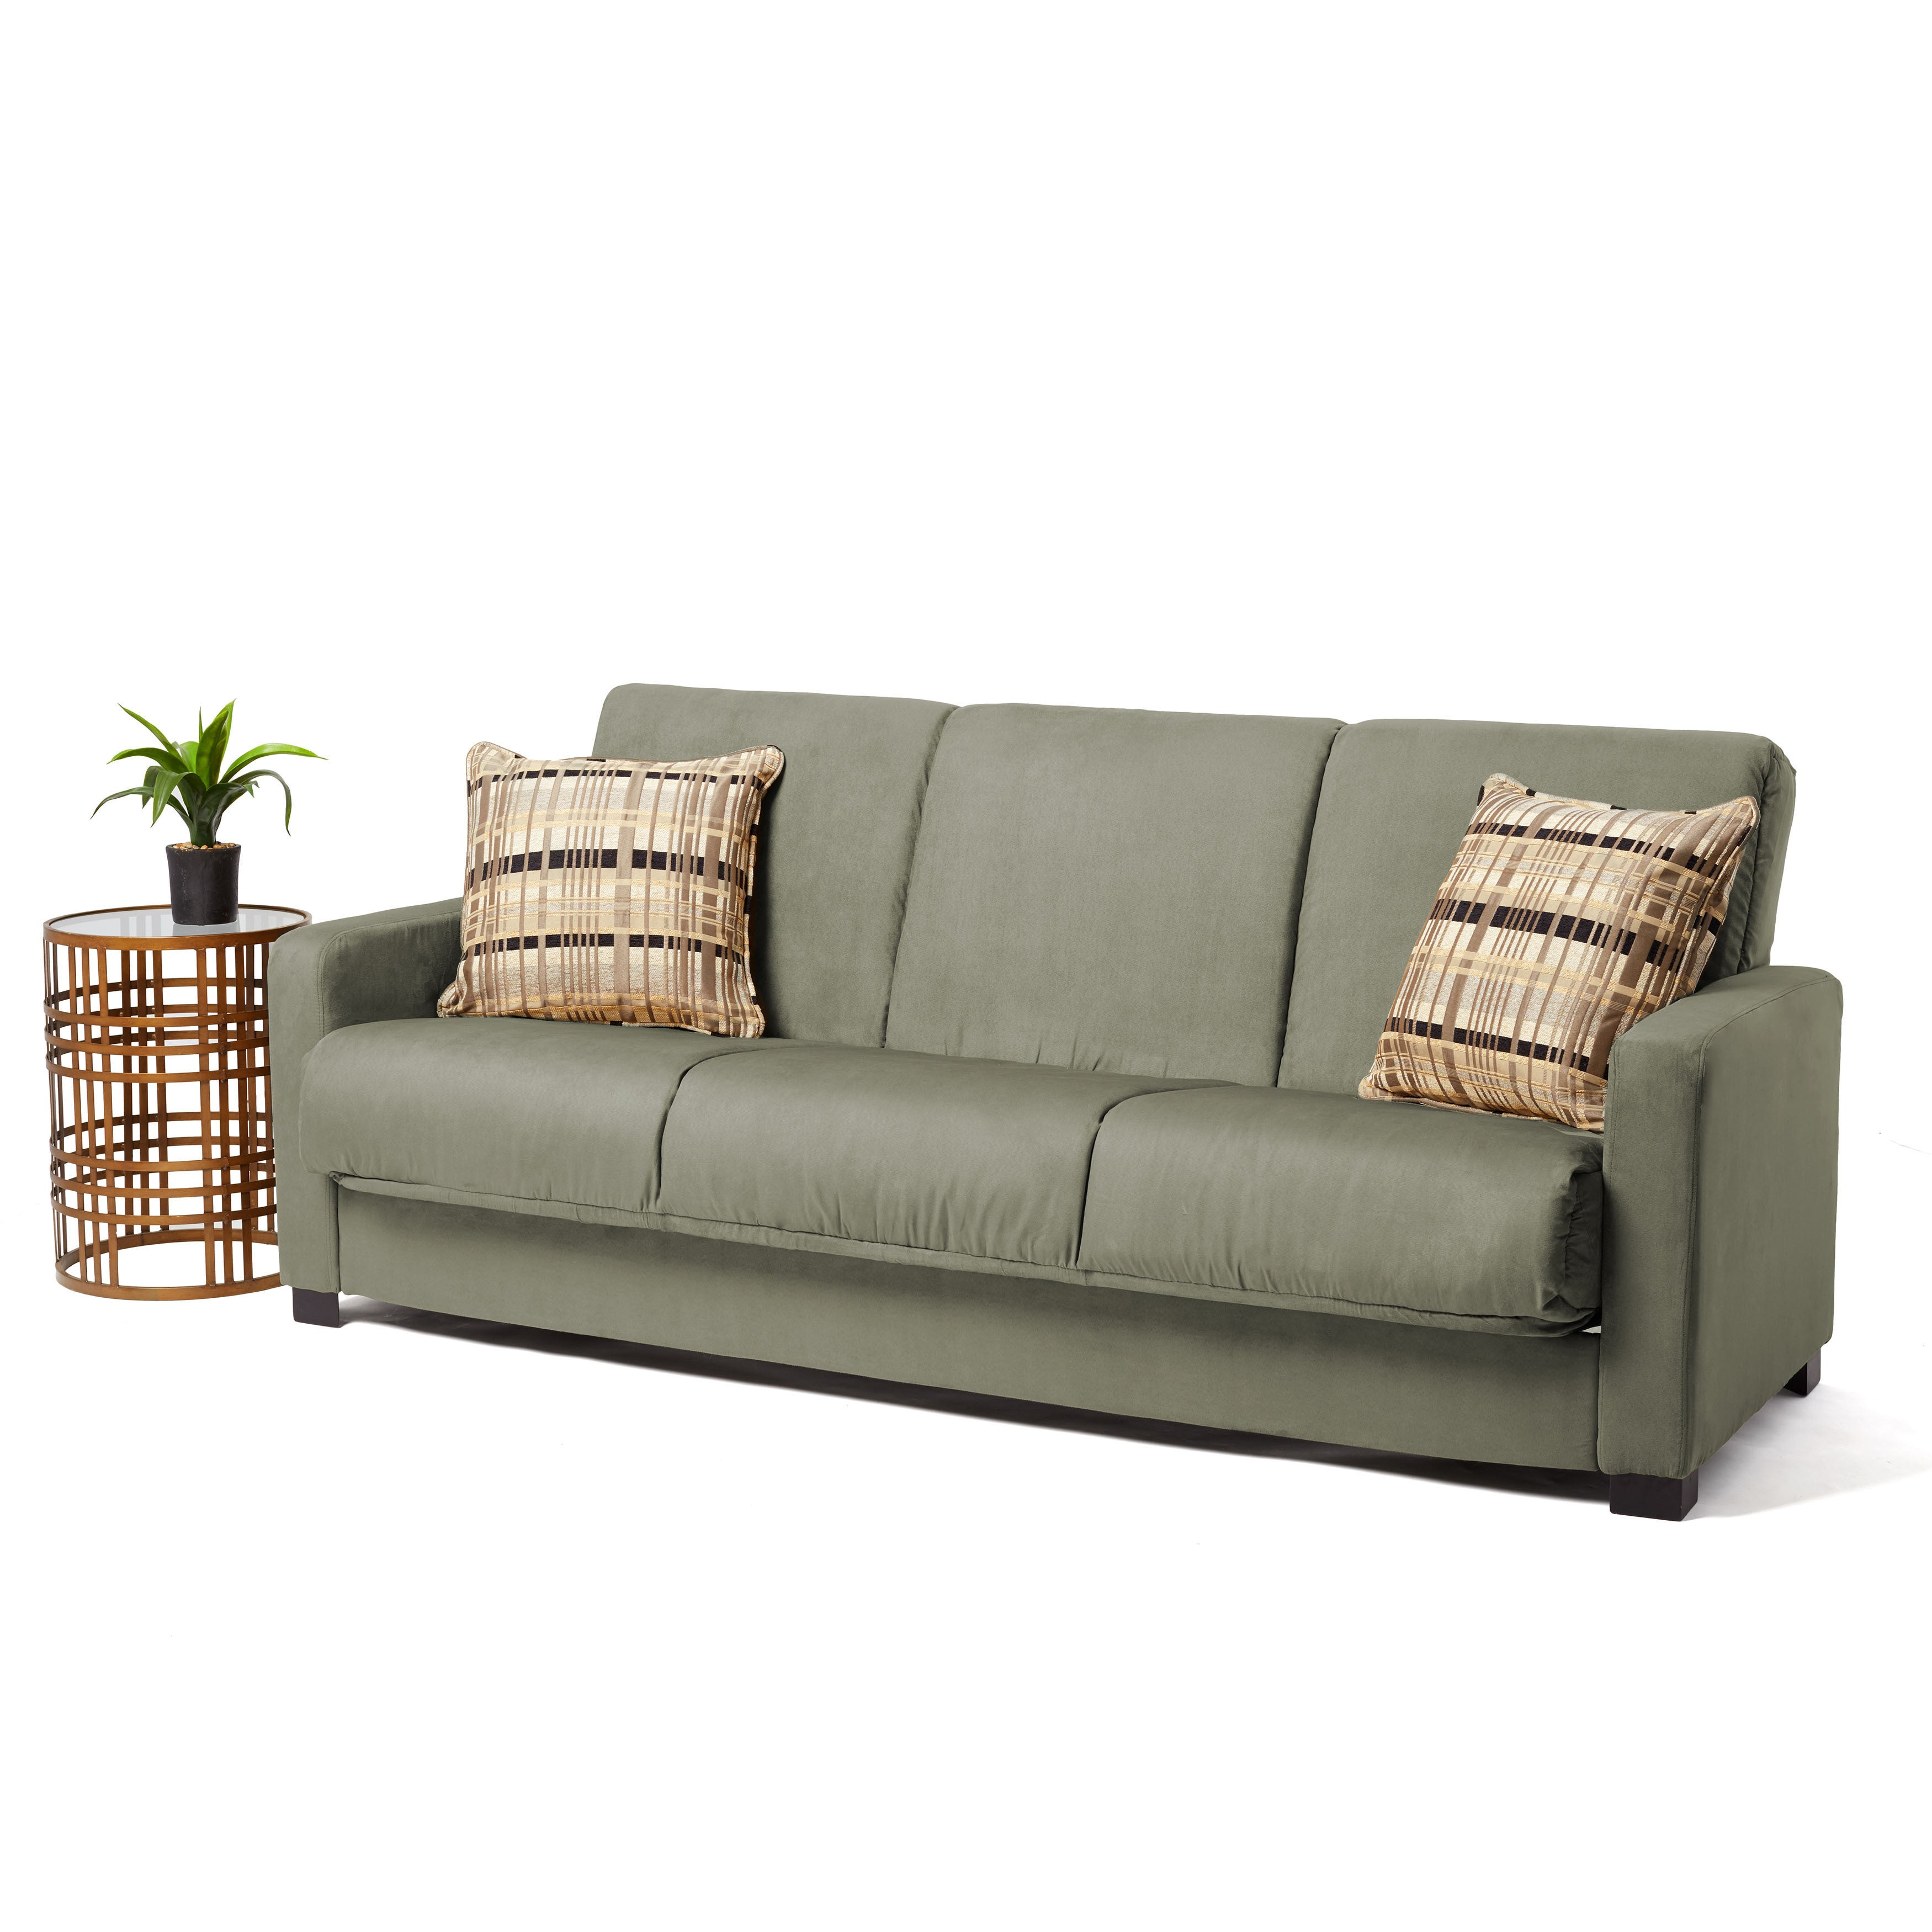 Handy Living Trace Convert a Couch Sage Grey Microfiber Futon Sofa